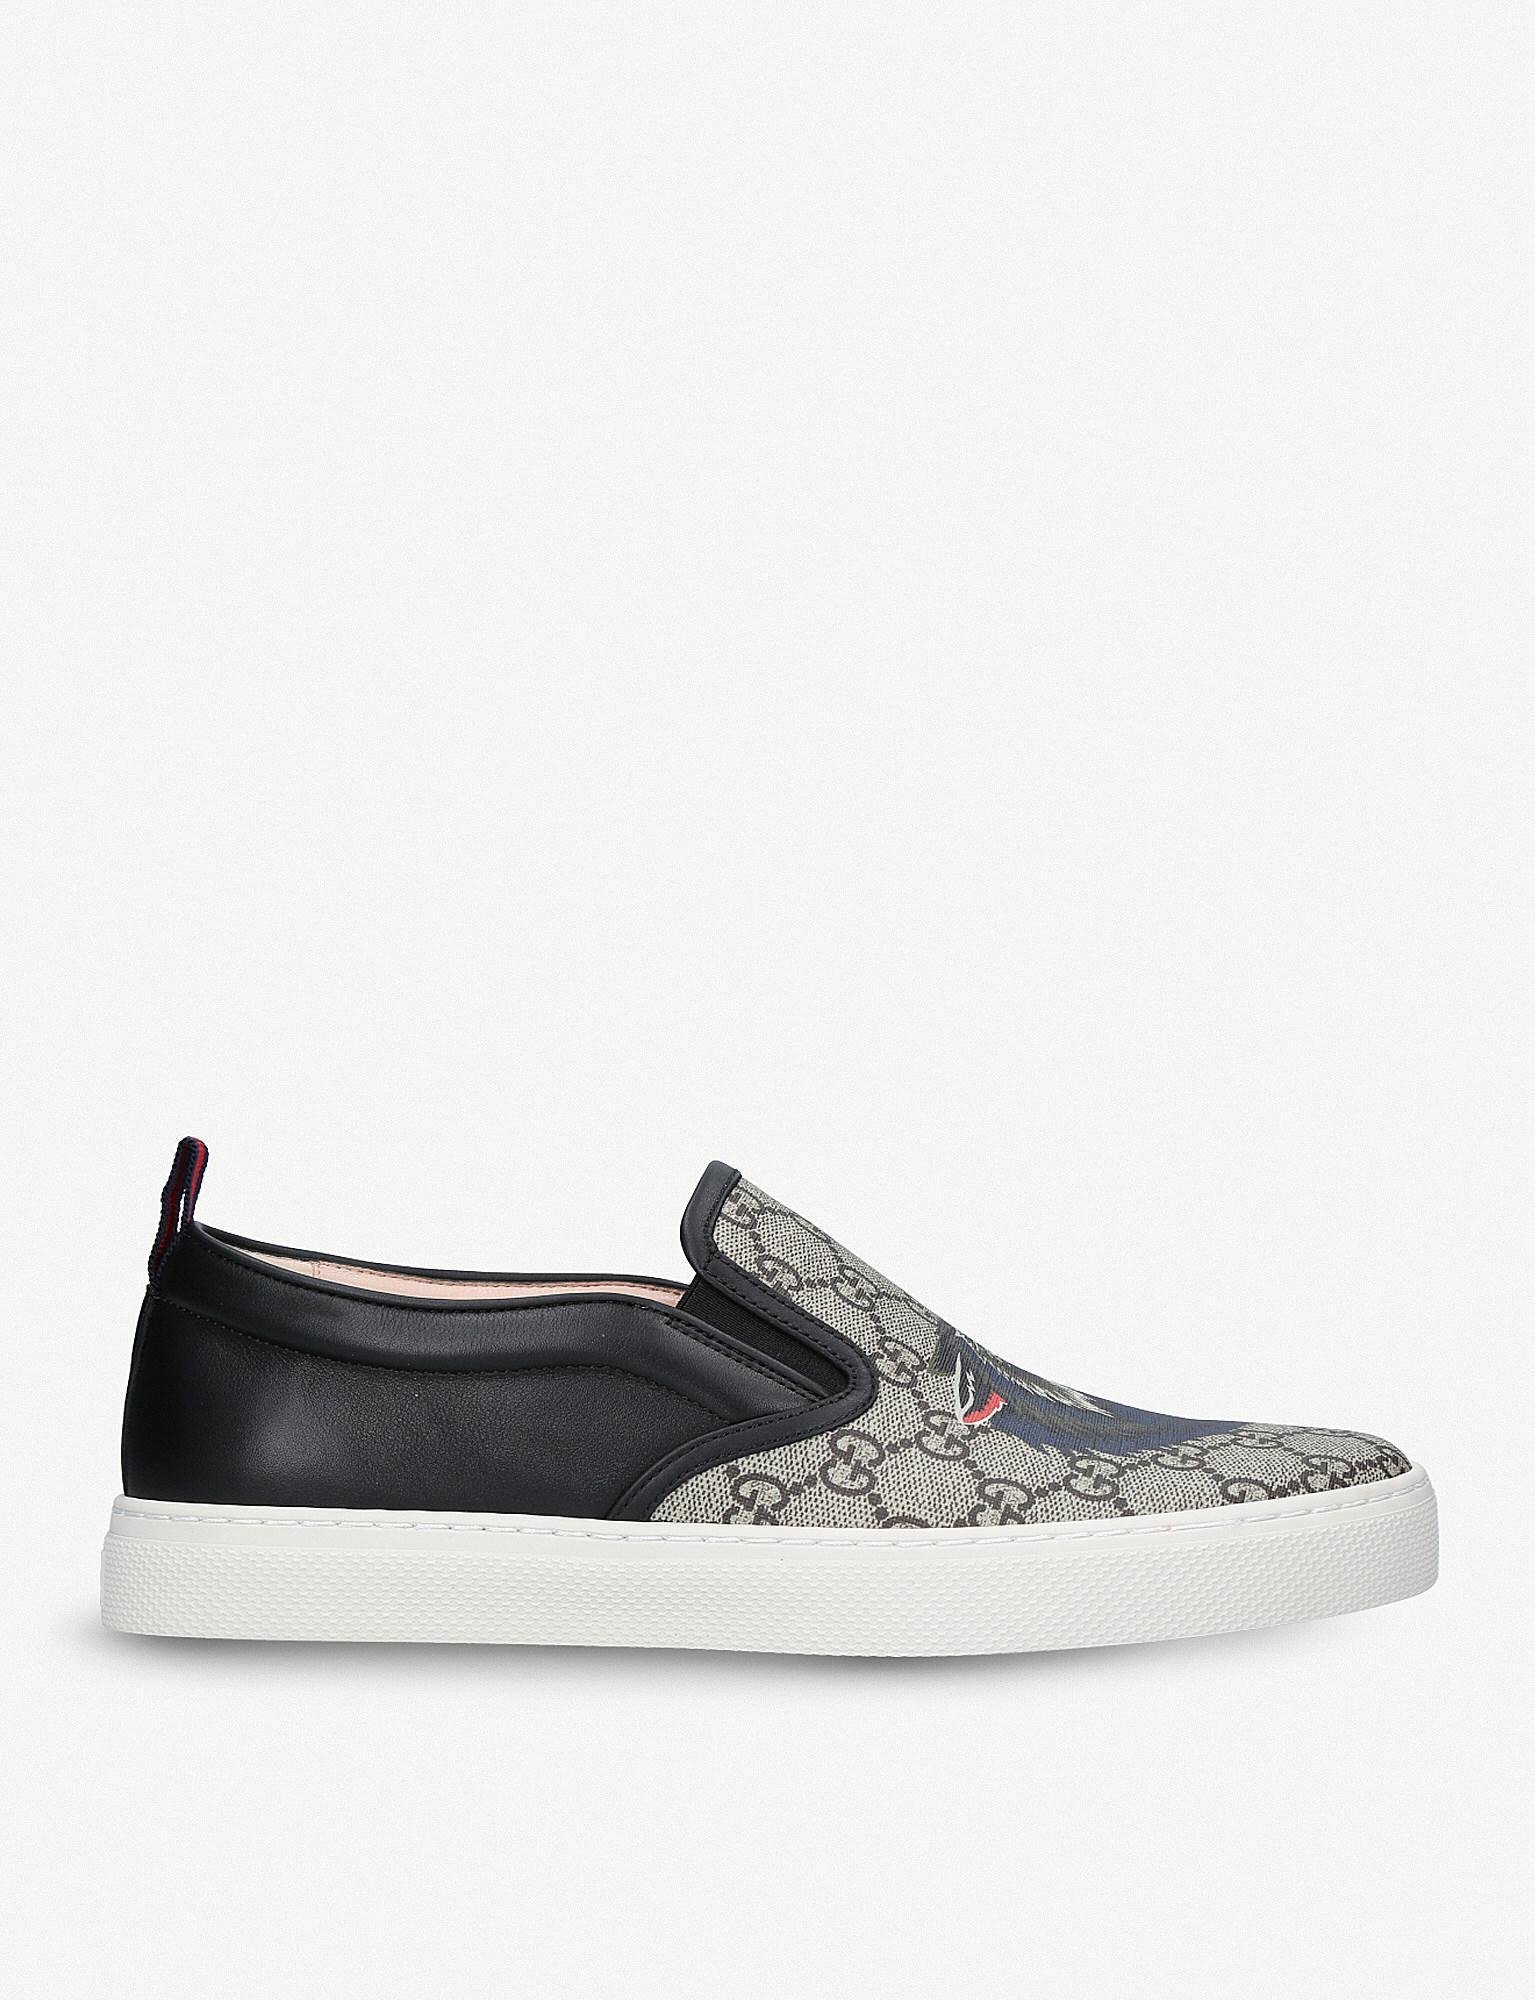 a1ac586e4 Gucci Dublin Wolf-print Canvas Skate Shoes in Brown for Men - Lyst